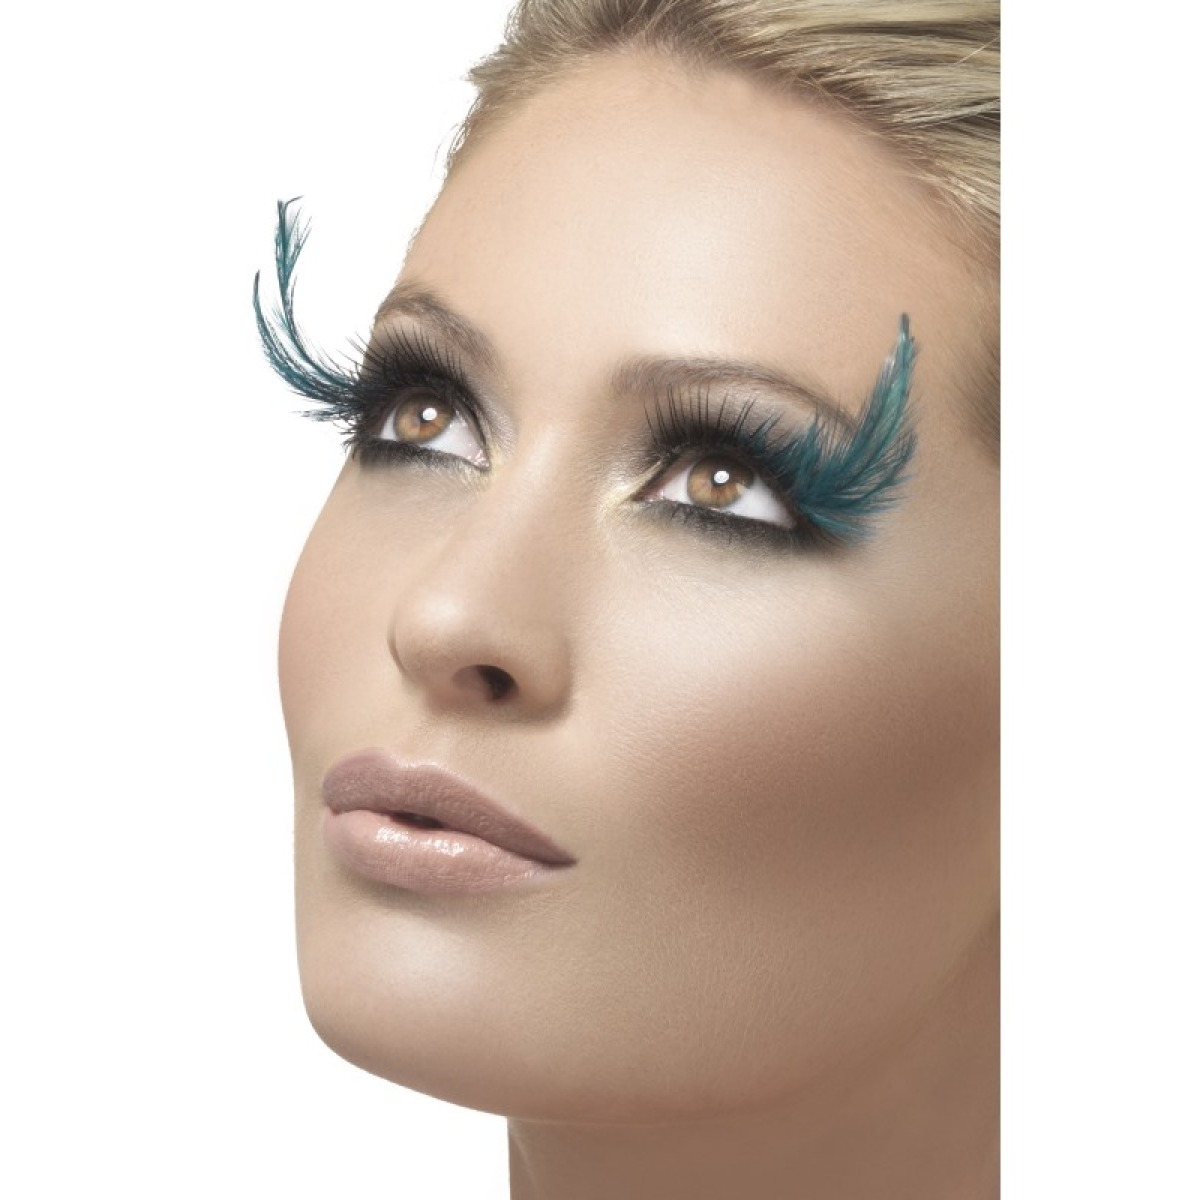 sm-37133-black-and-green-feather-eyelash